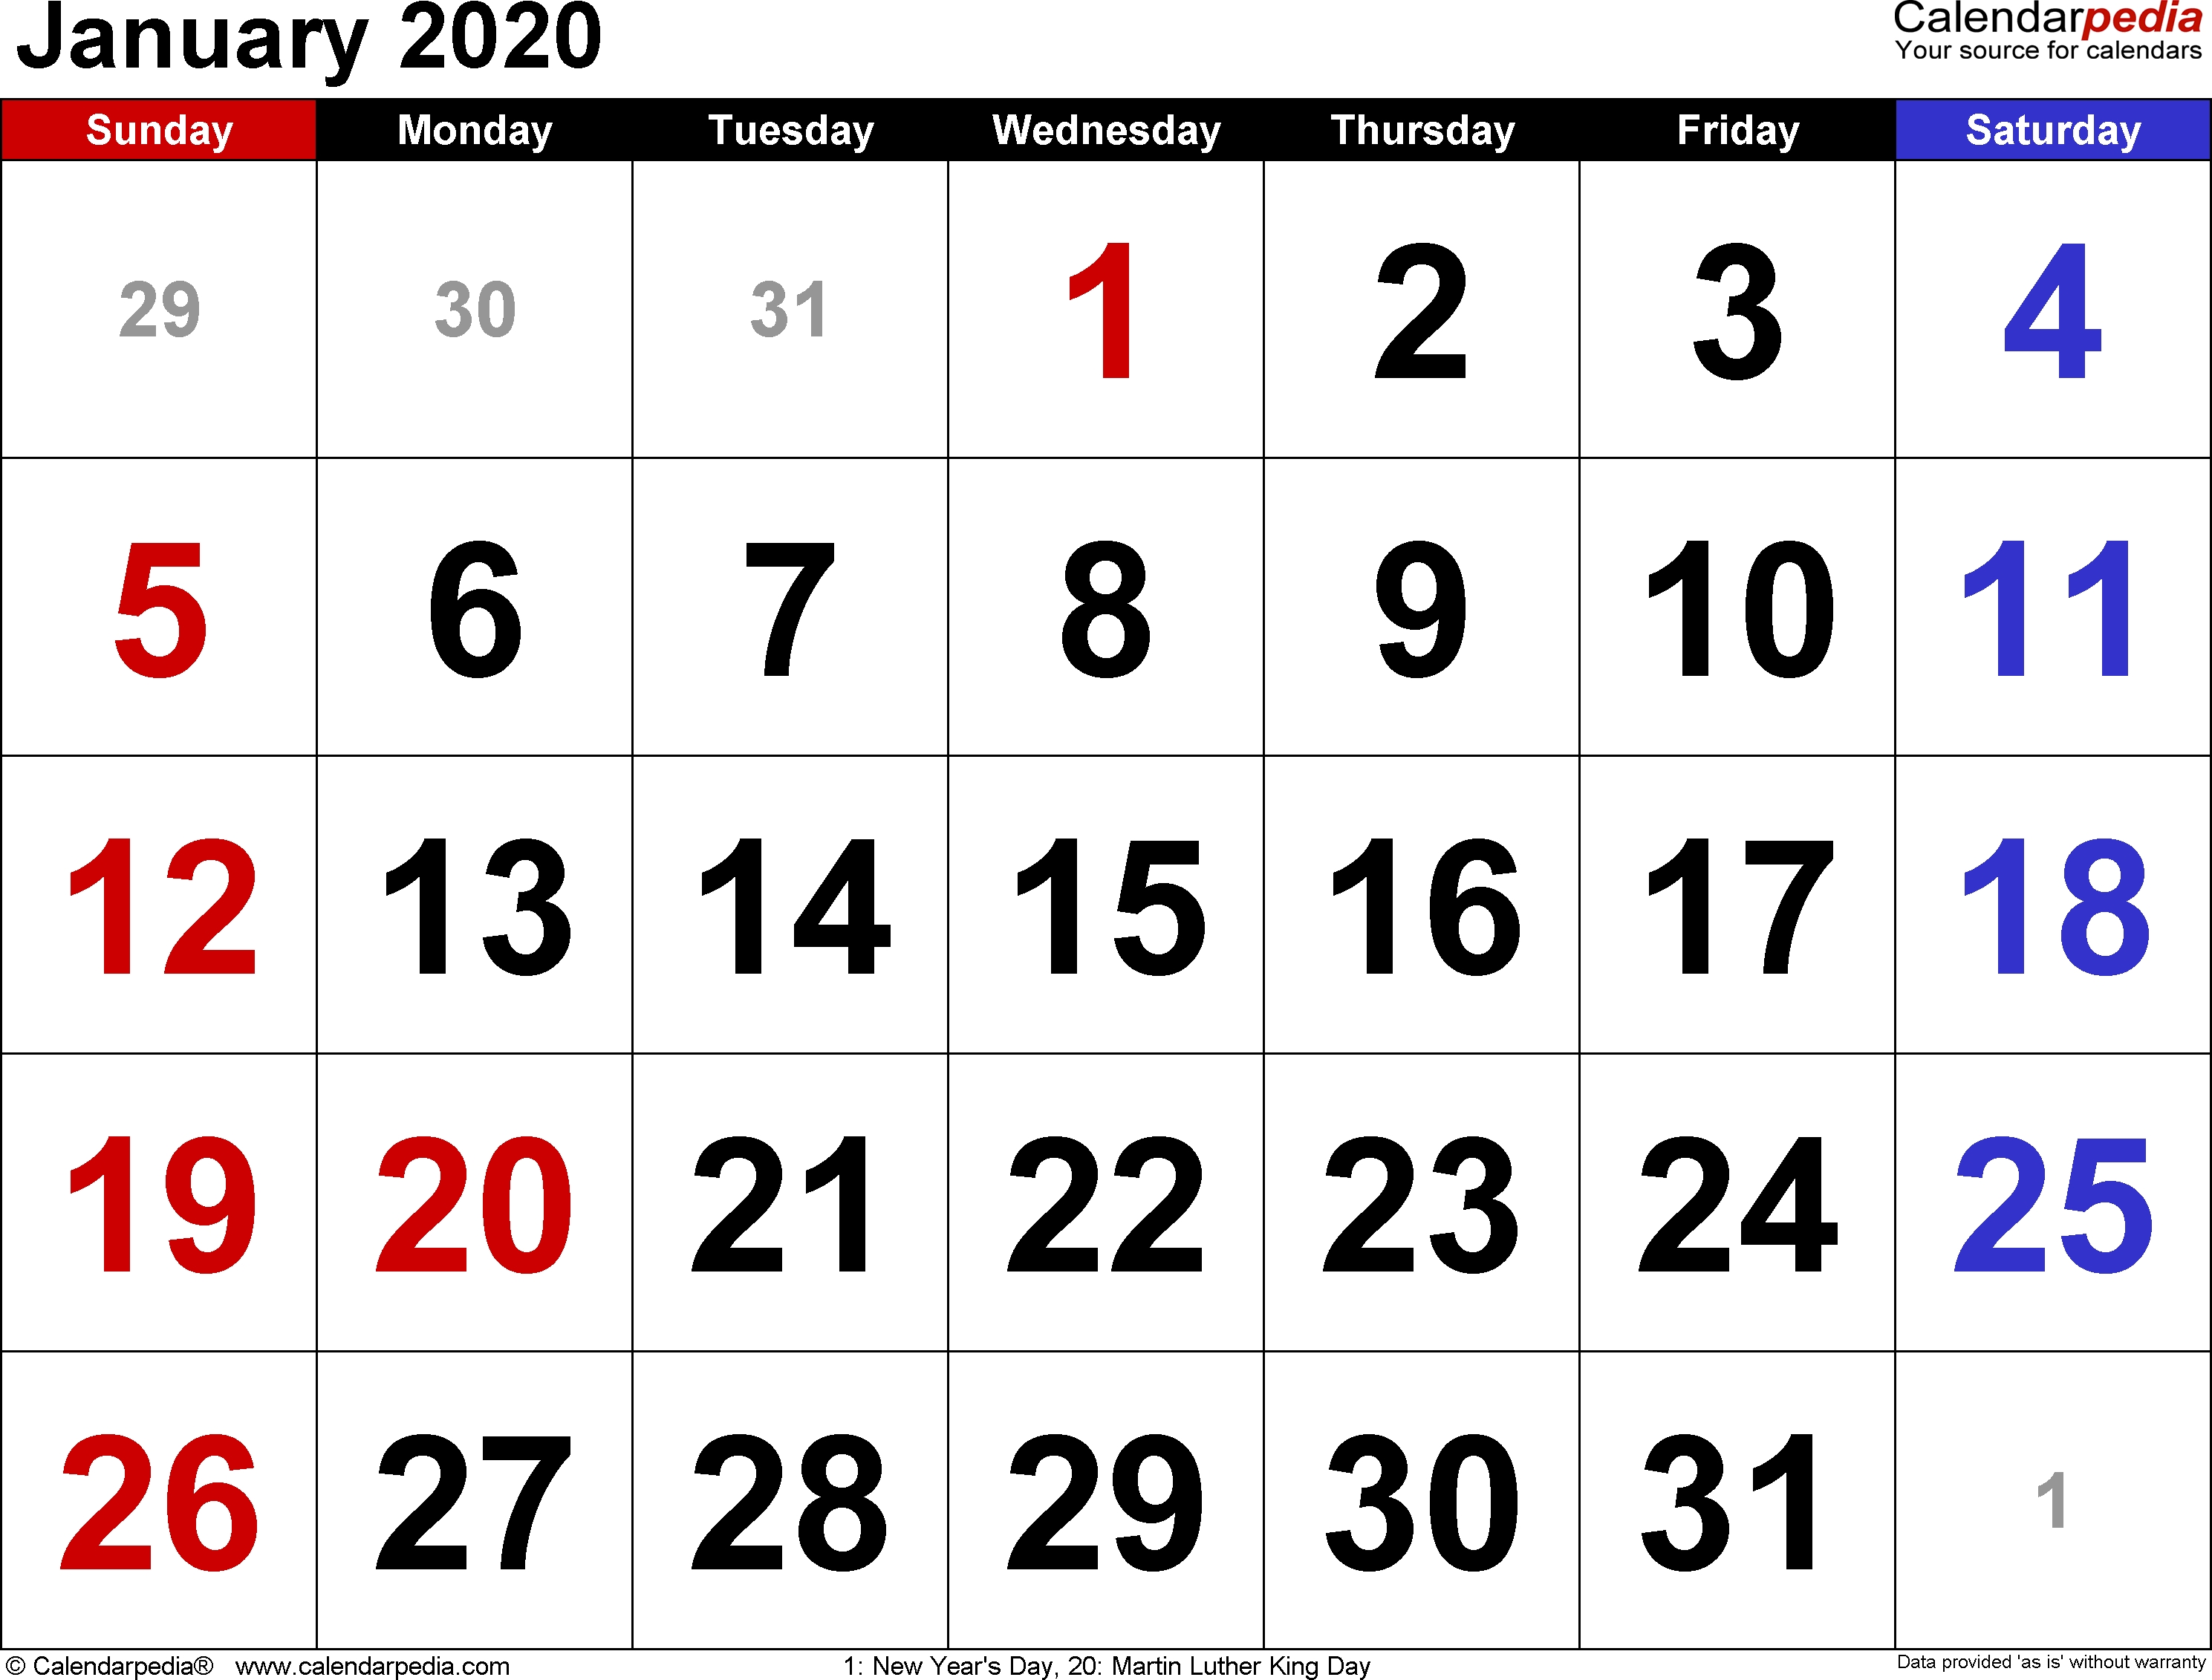 January 2020 Calendars For Word, Excel & Pdf-January 2020 Calendar Usa